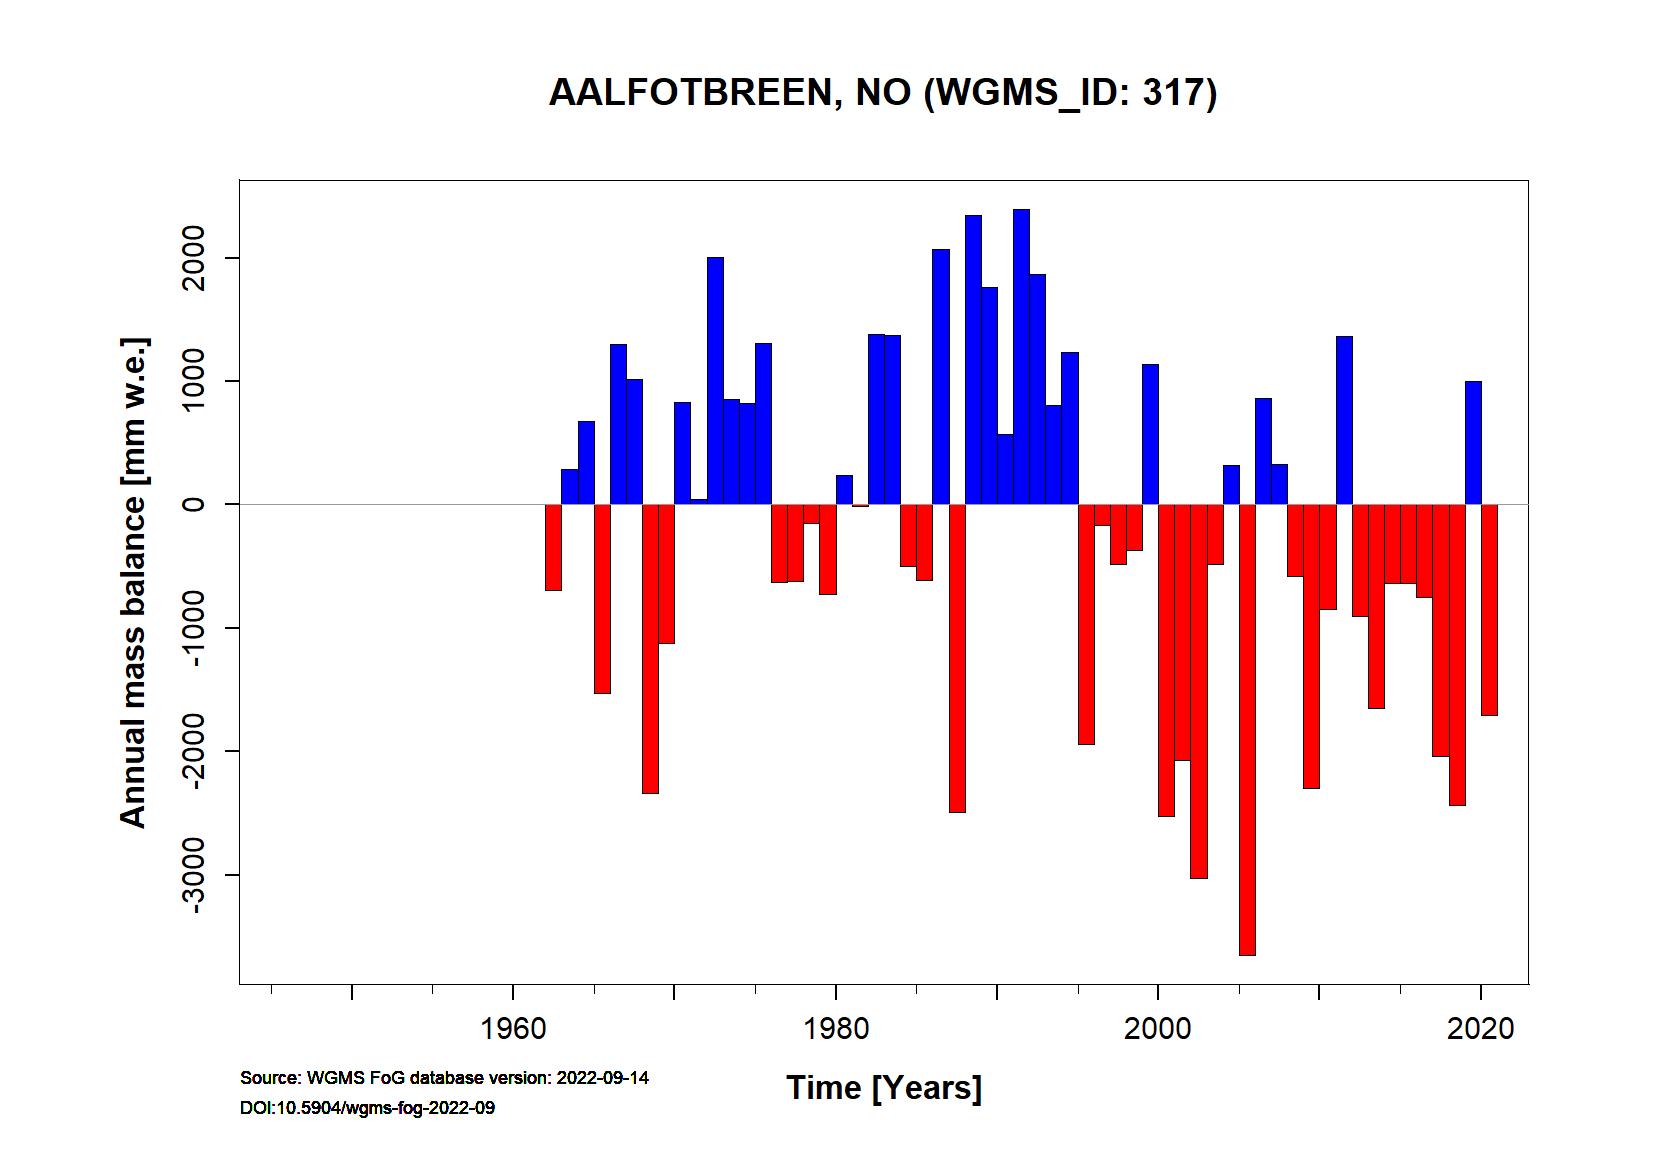 Aalfotbreen Annual Mass Balance (WGMS, 2016)